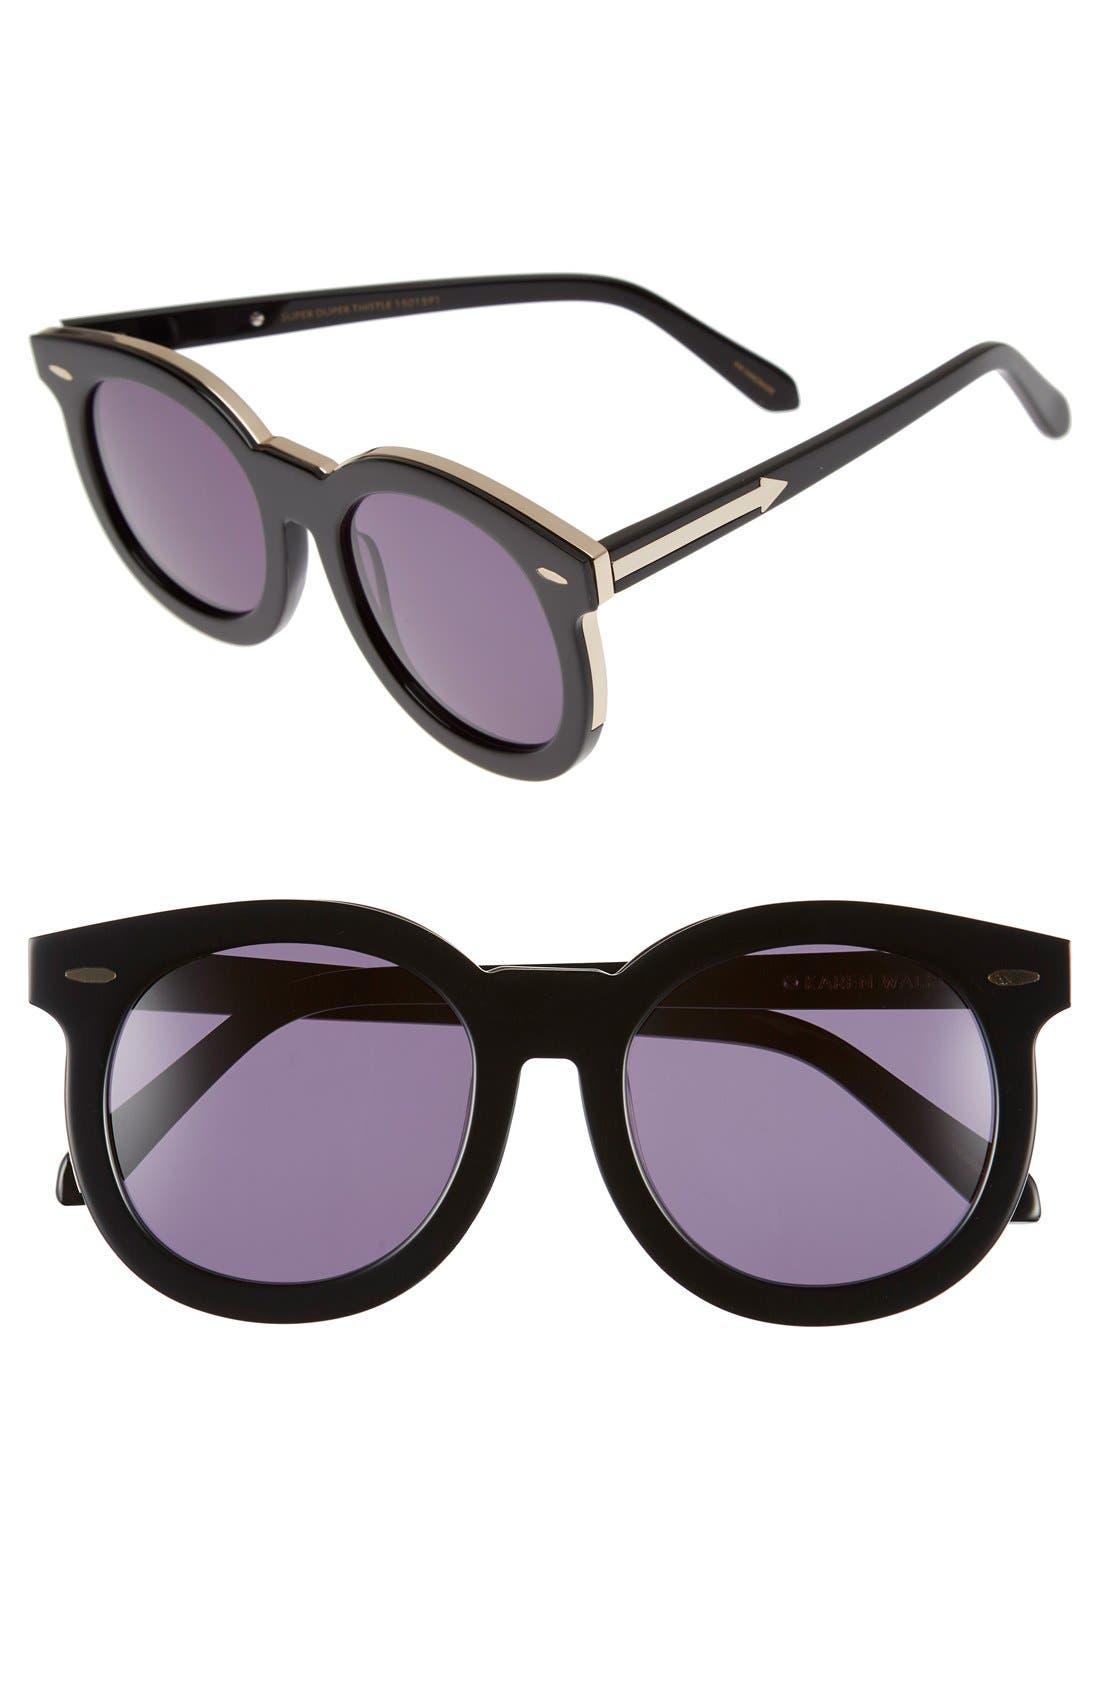 'Super Duper Thistle' 52mm Retro Sunglasses,                         Main,                         color, Black/ Gold